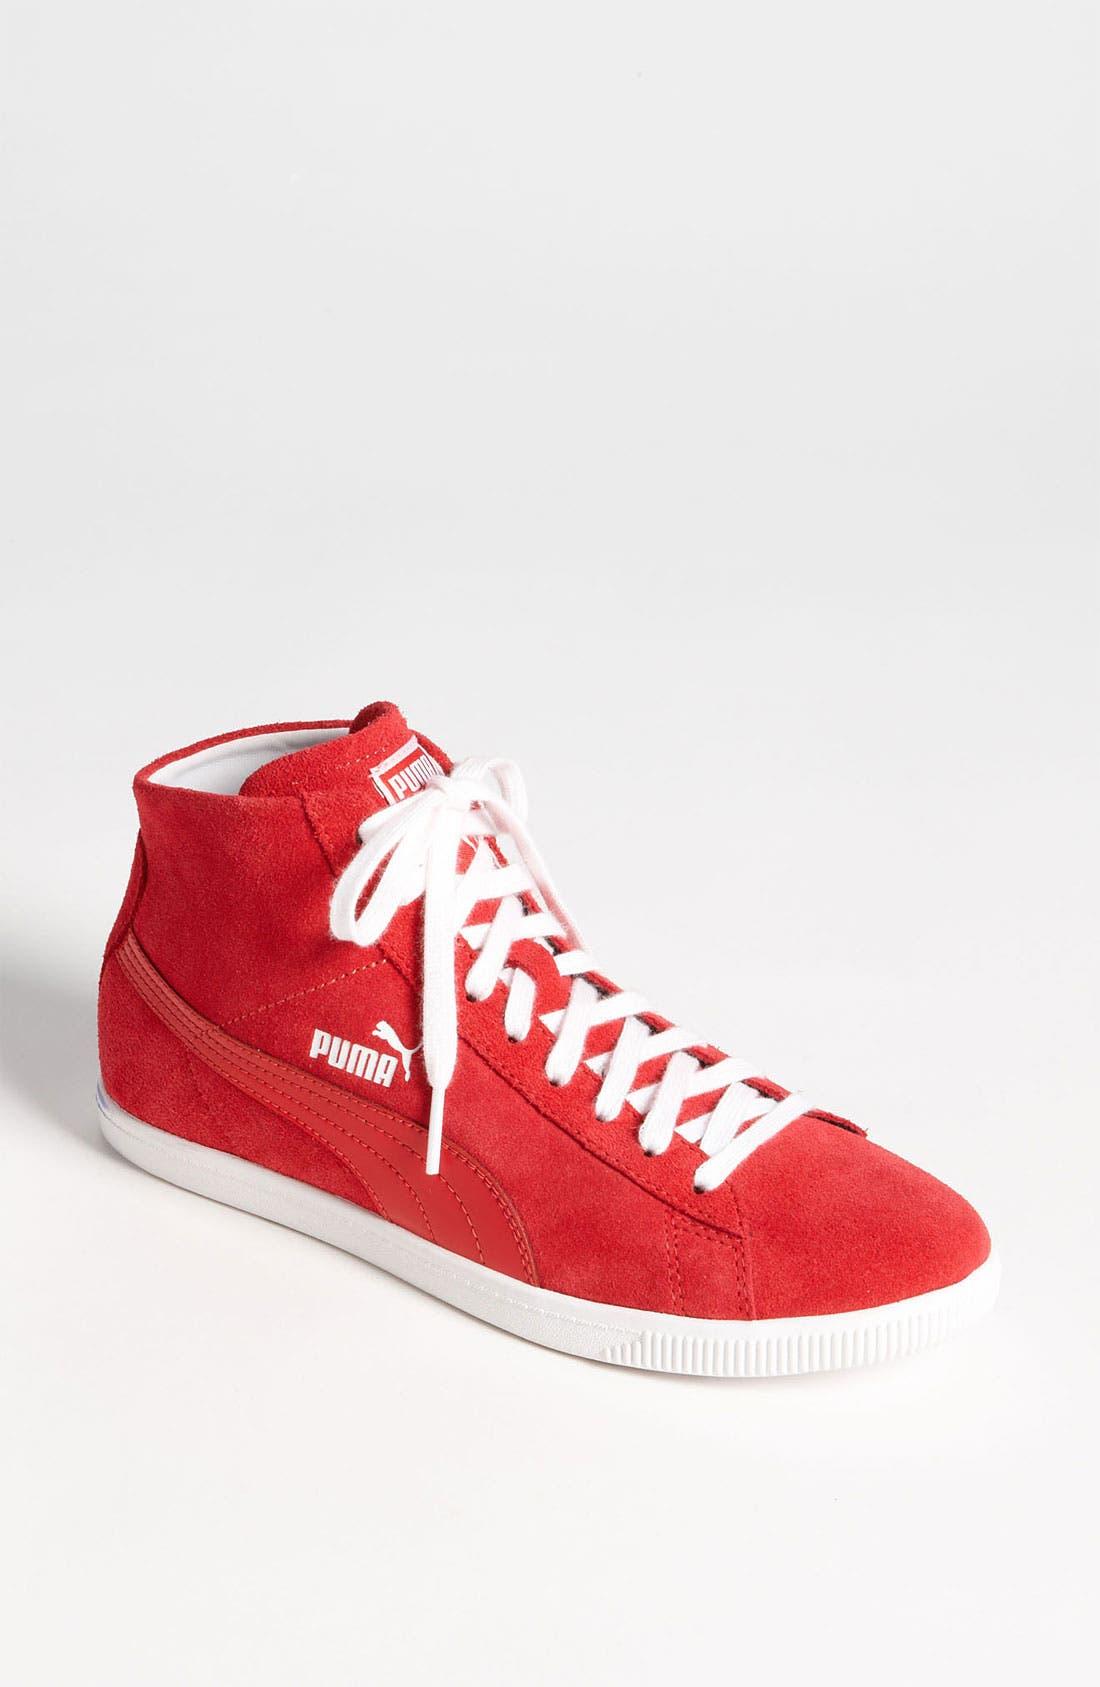 Alternate Image 1 Selected - PUMA 'Glyde Mid' Sneaker (Women)